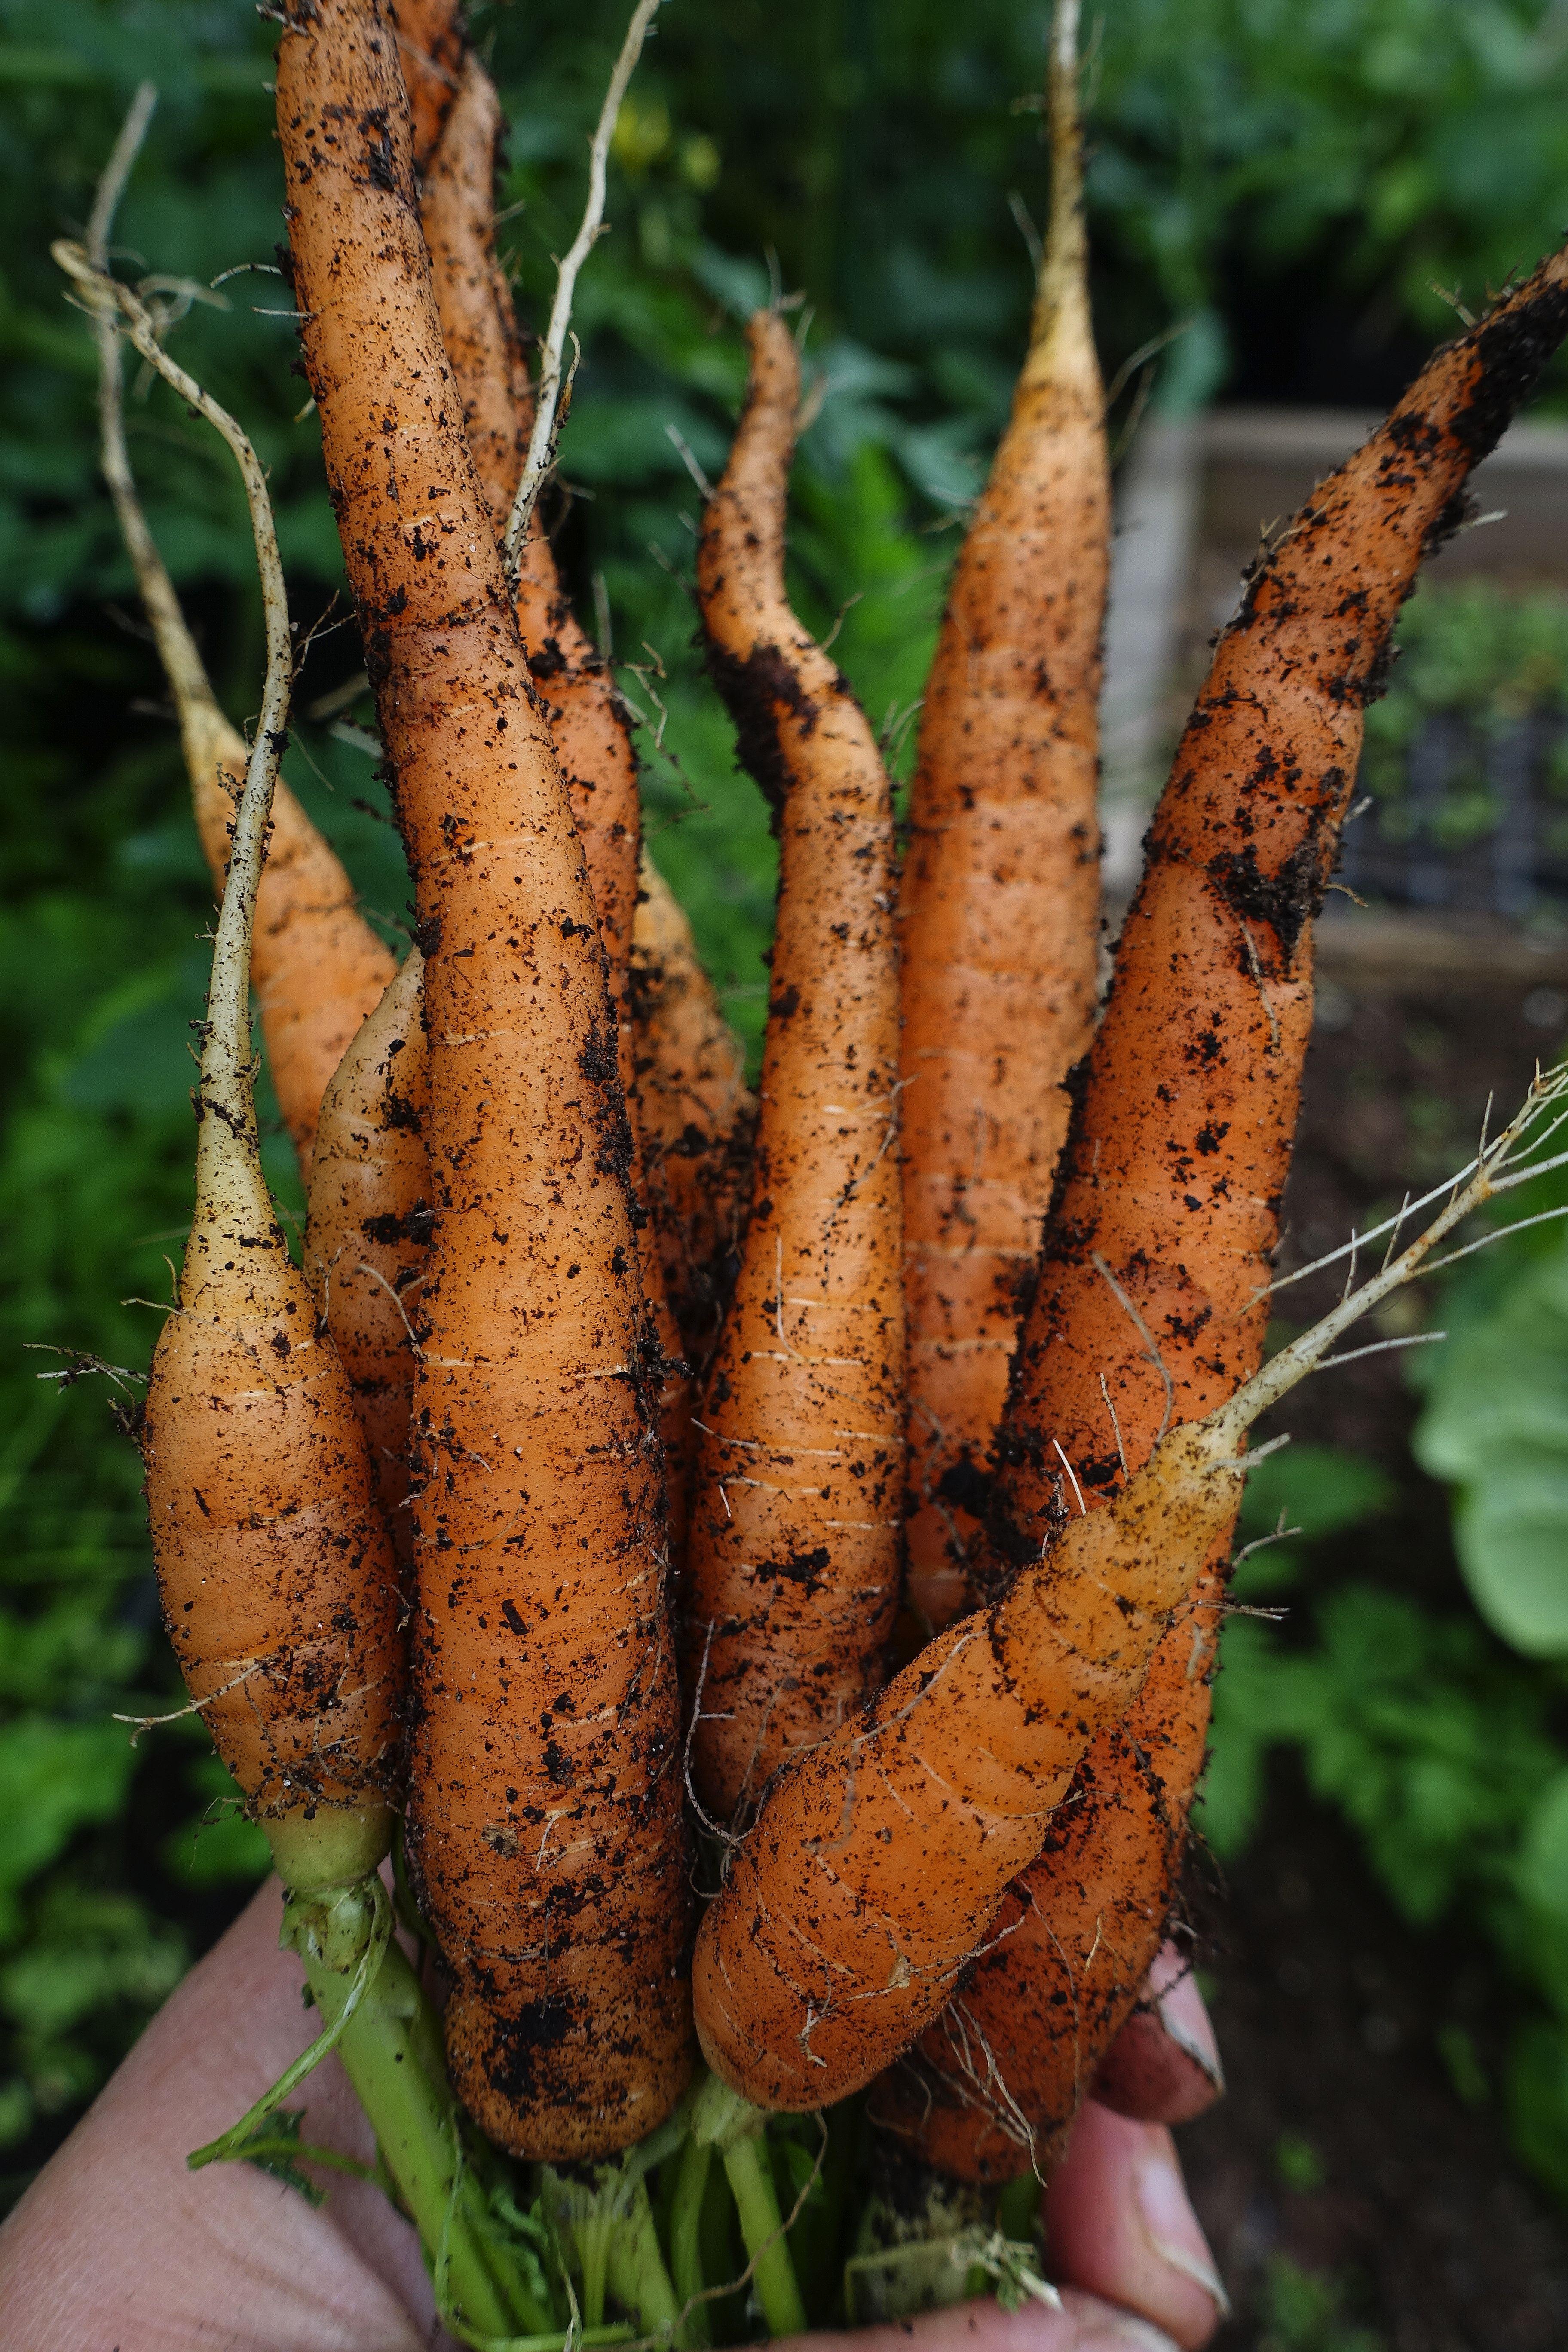 En hand håller ett fint knippe med morötter. Harvesting carrots: A hand holding a bunch of carrots.